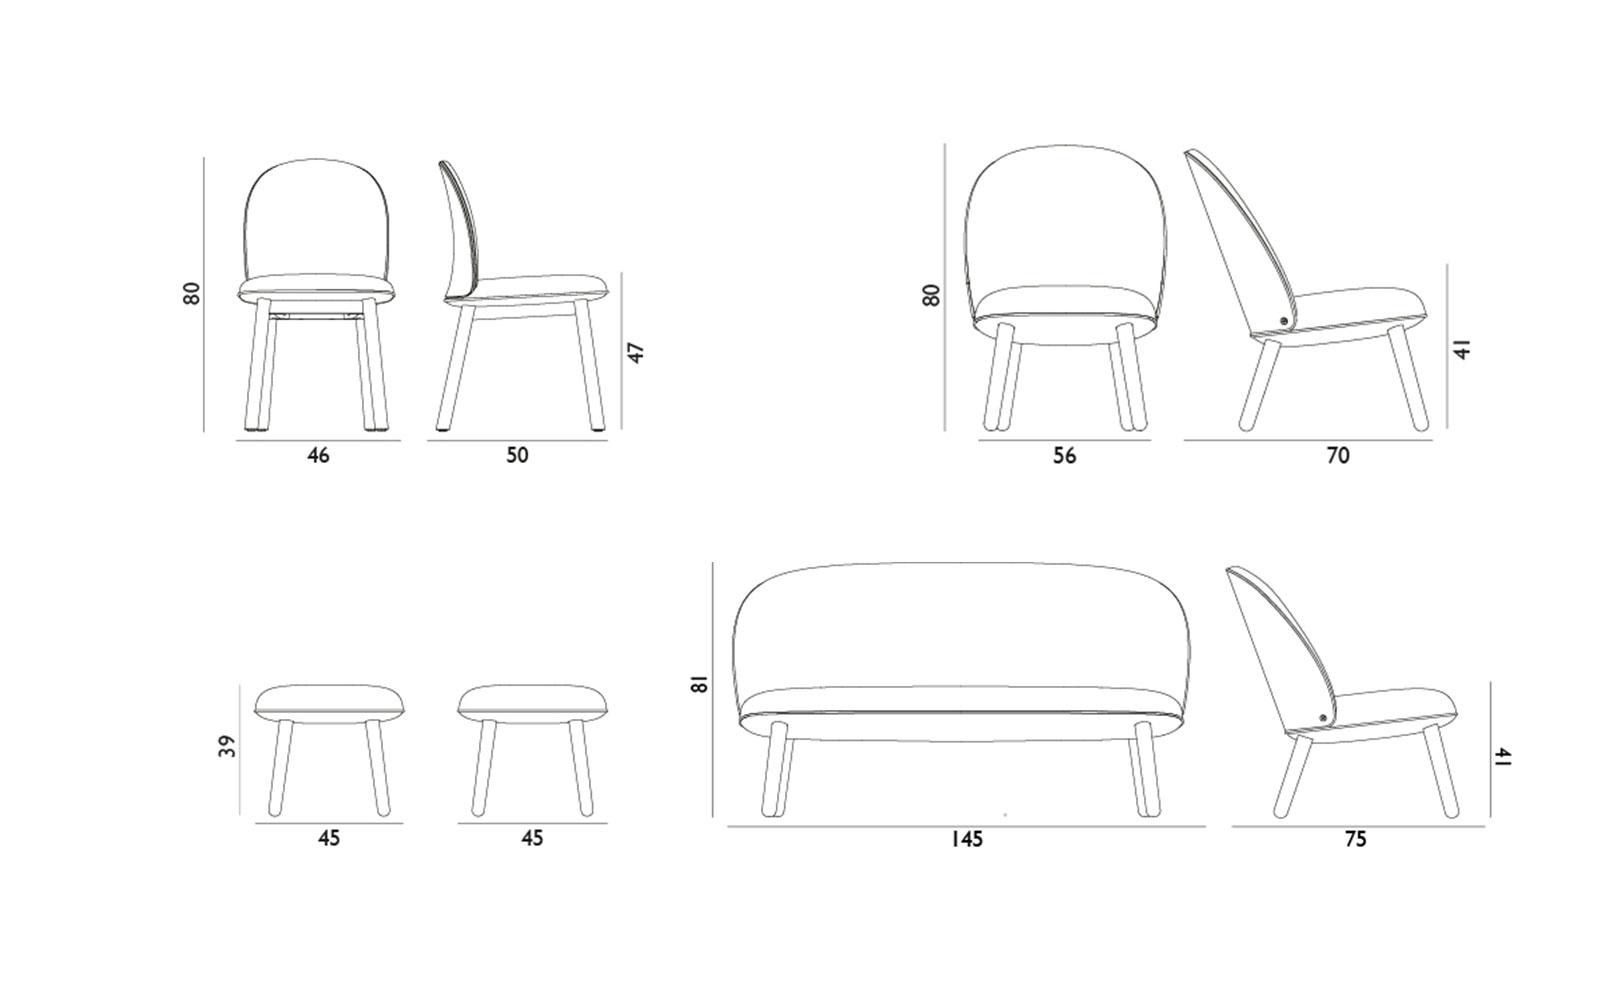 Bett strichzeichnung  All Eyes On Ace - Flatpacked Lounge Furniture